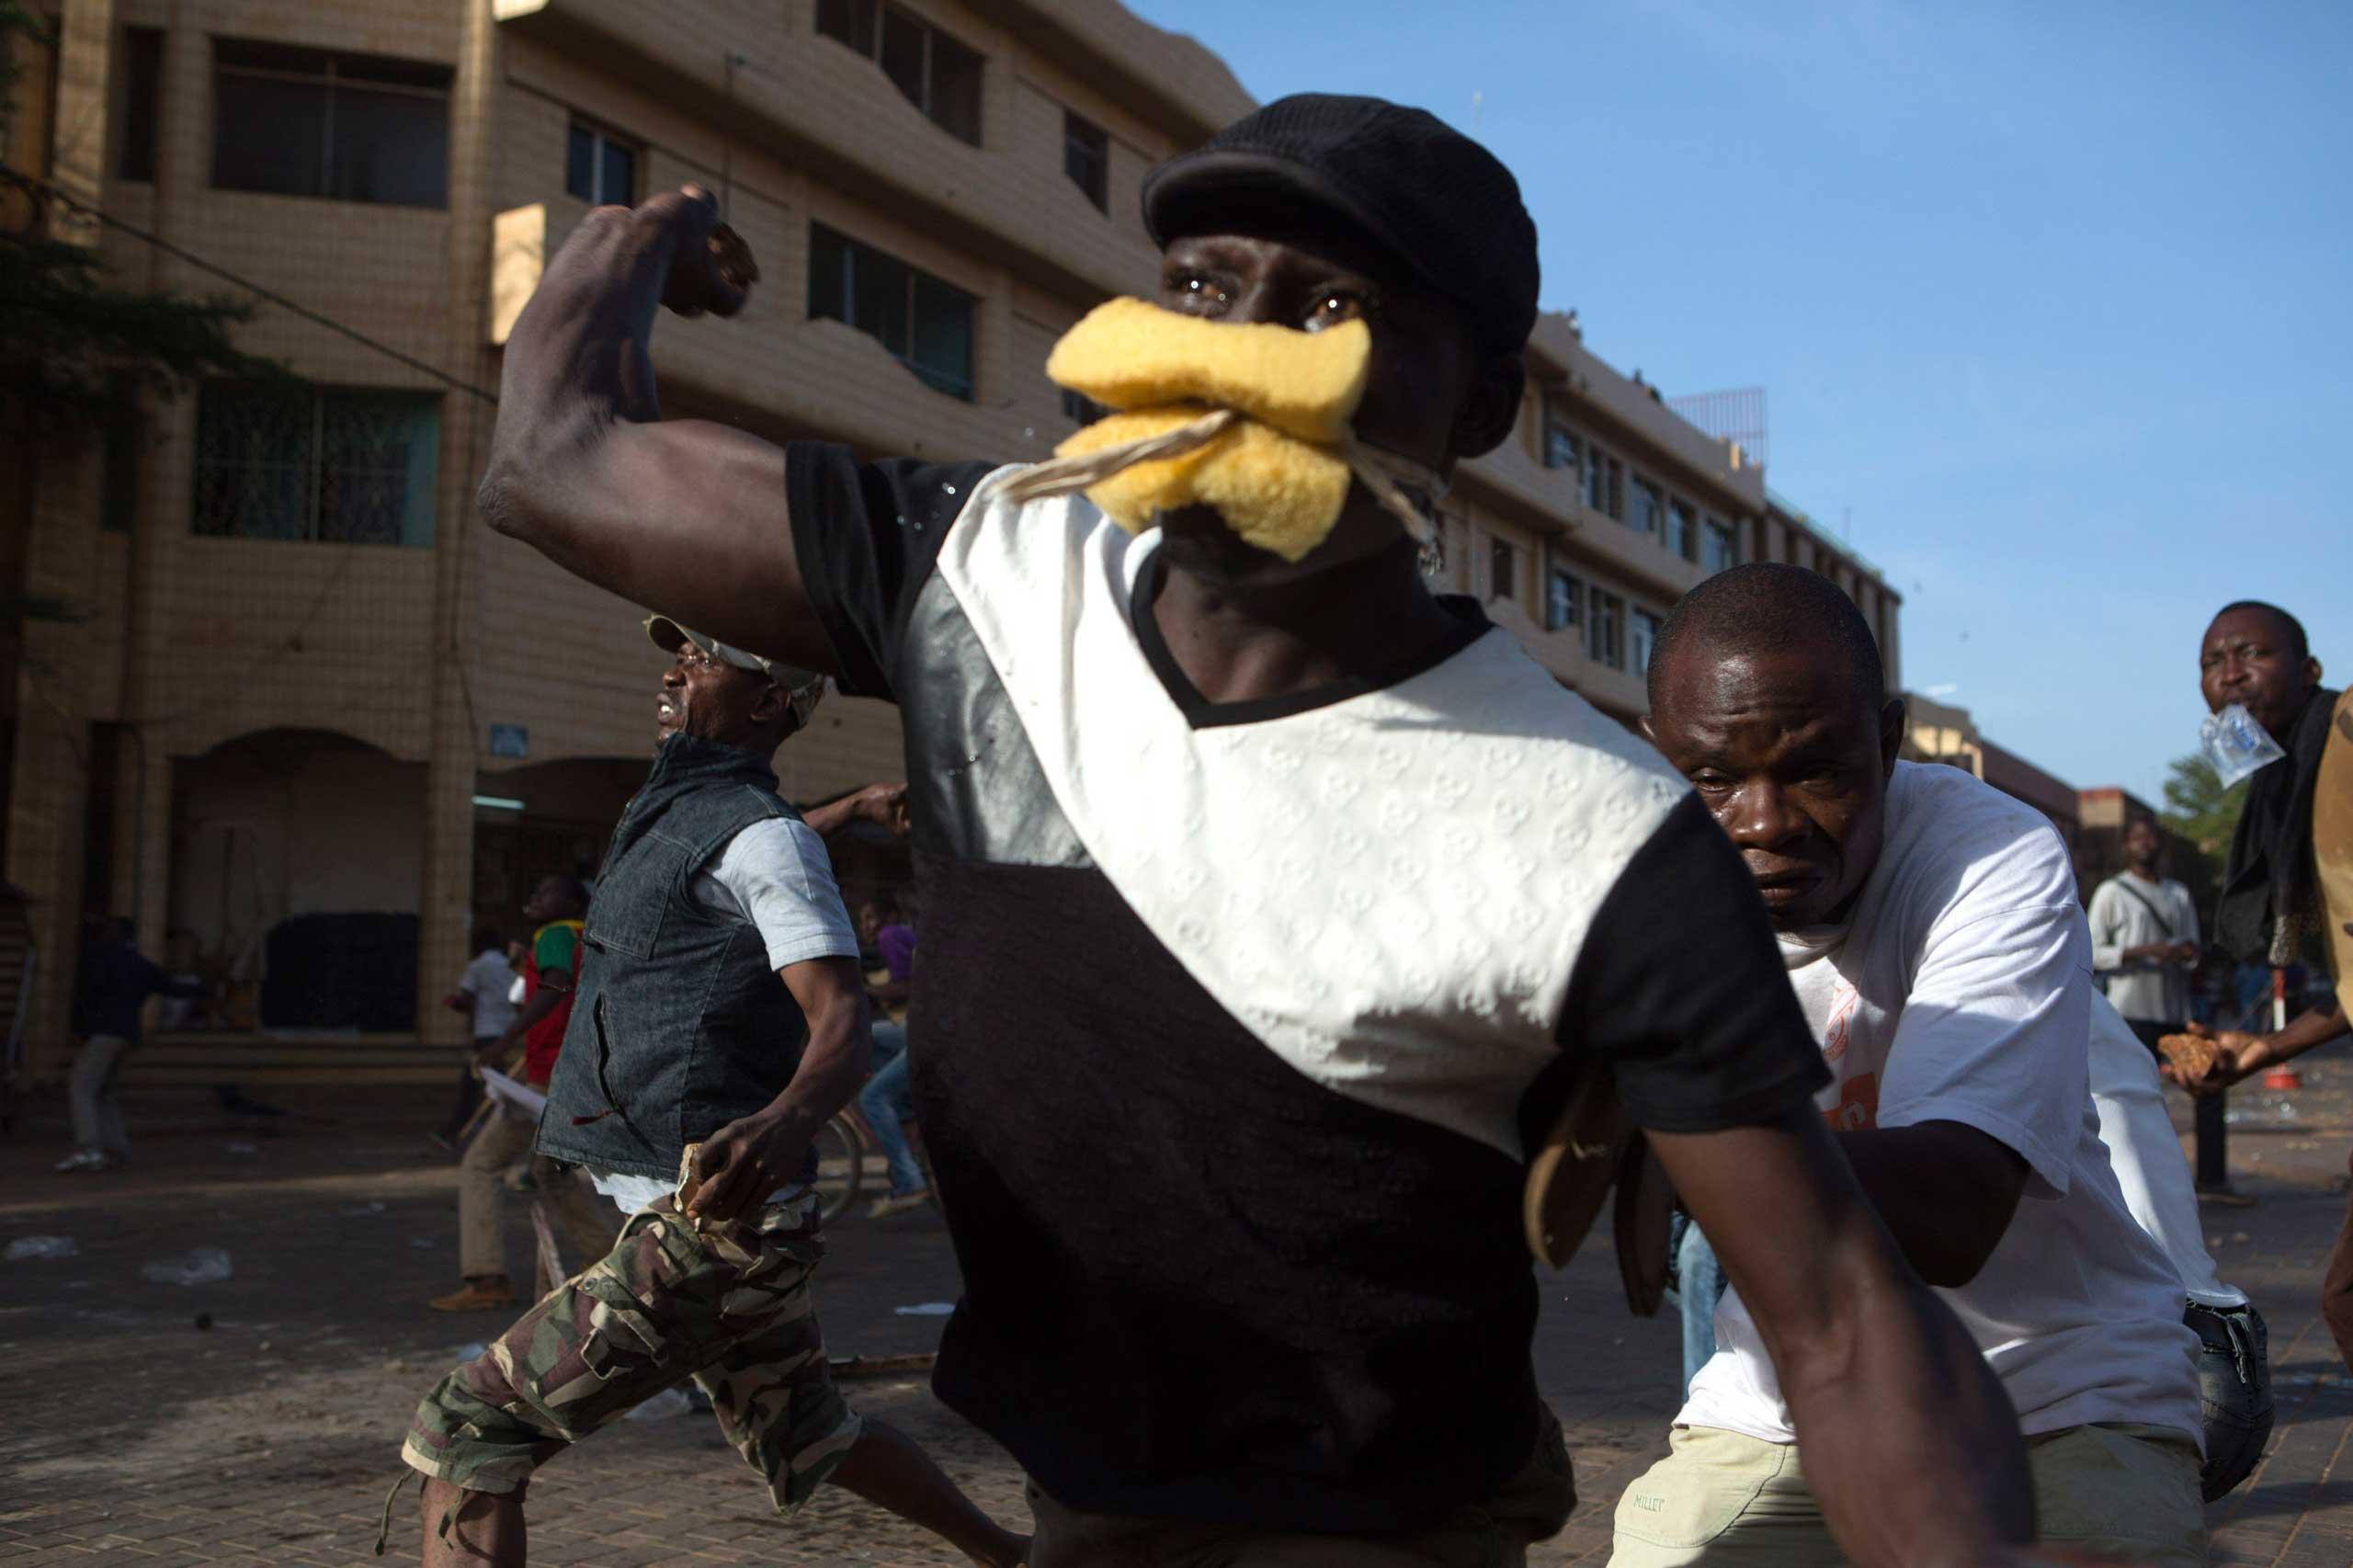 Anti-government protesters throw rocks at police in Ouagadougou, capital of Burkina Faso, Oct. 30, 2014.